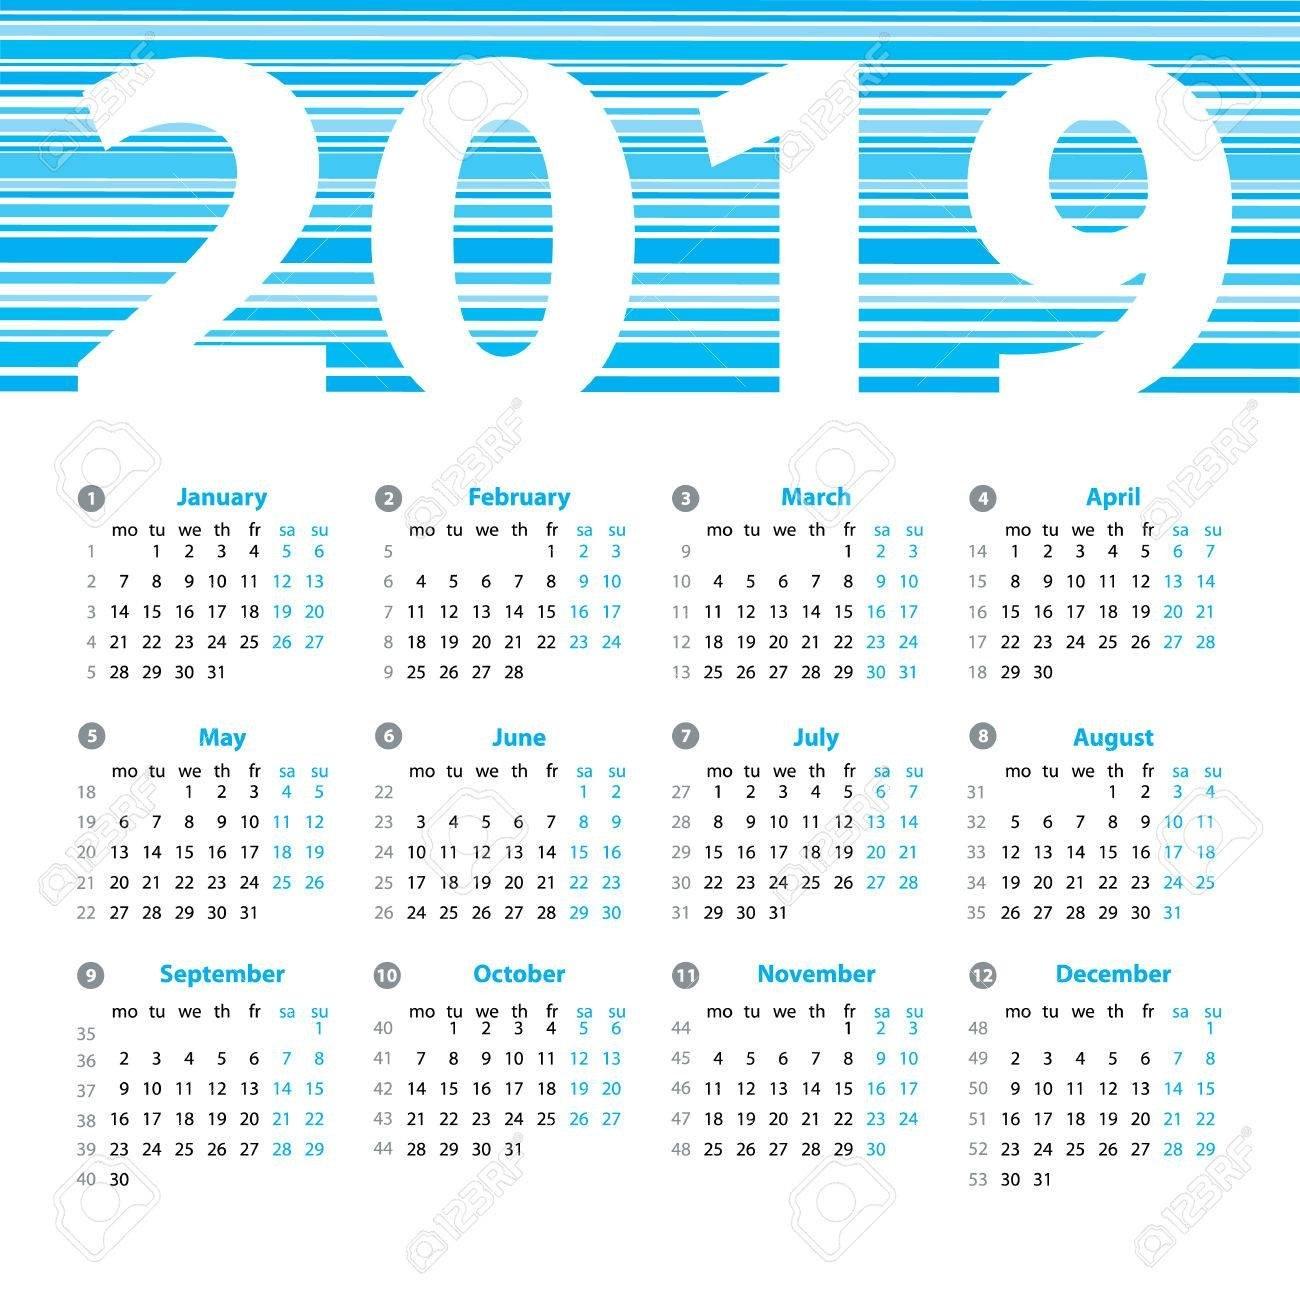 Calendar 2019 Year Vector Design Template With Week Numbers And Calendar 2019 With Week Numbers